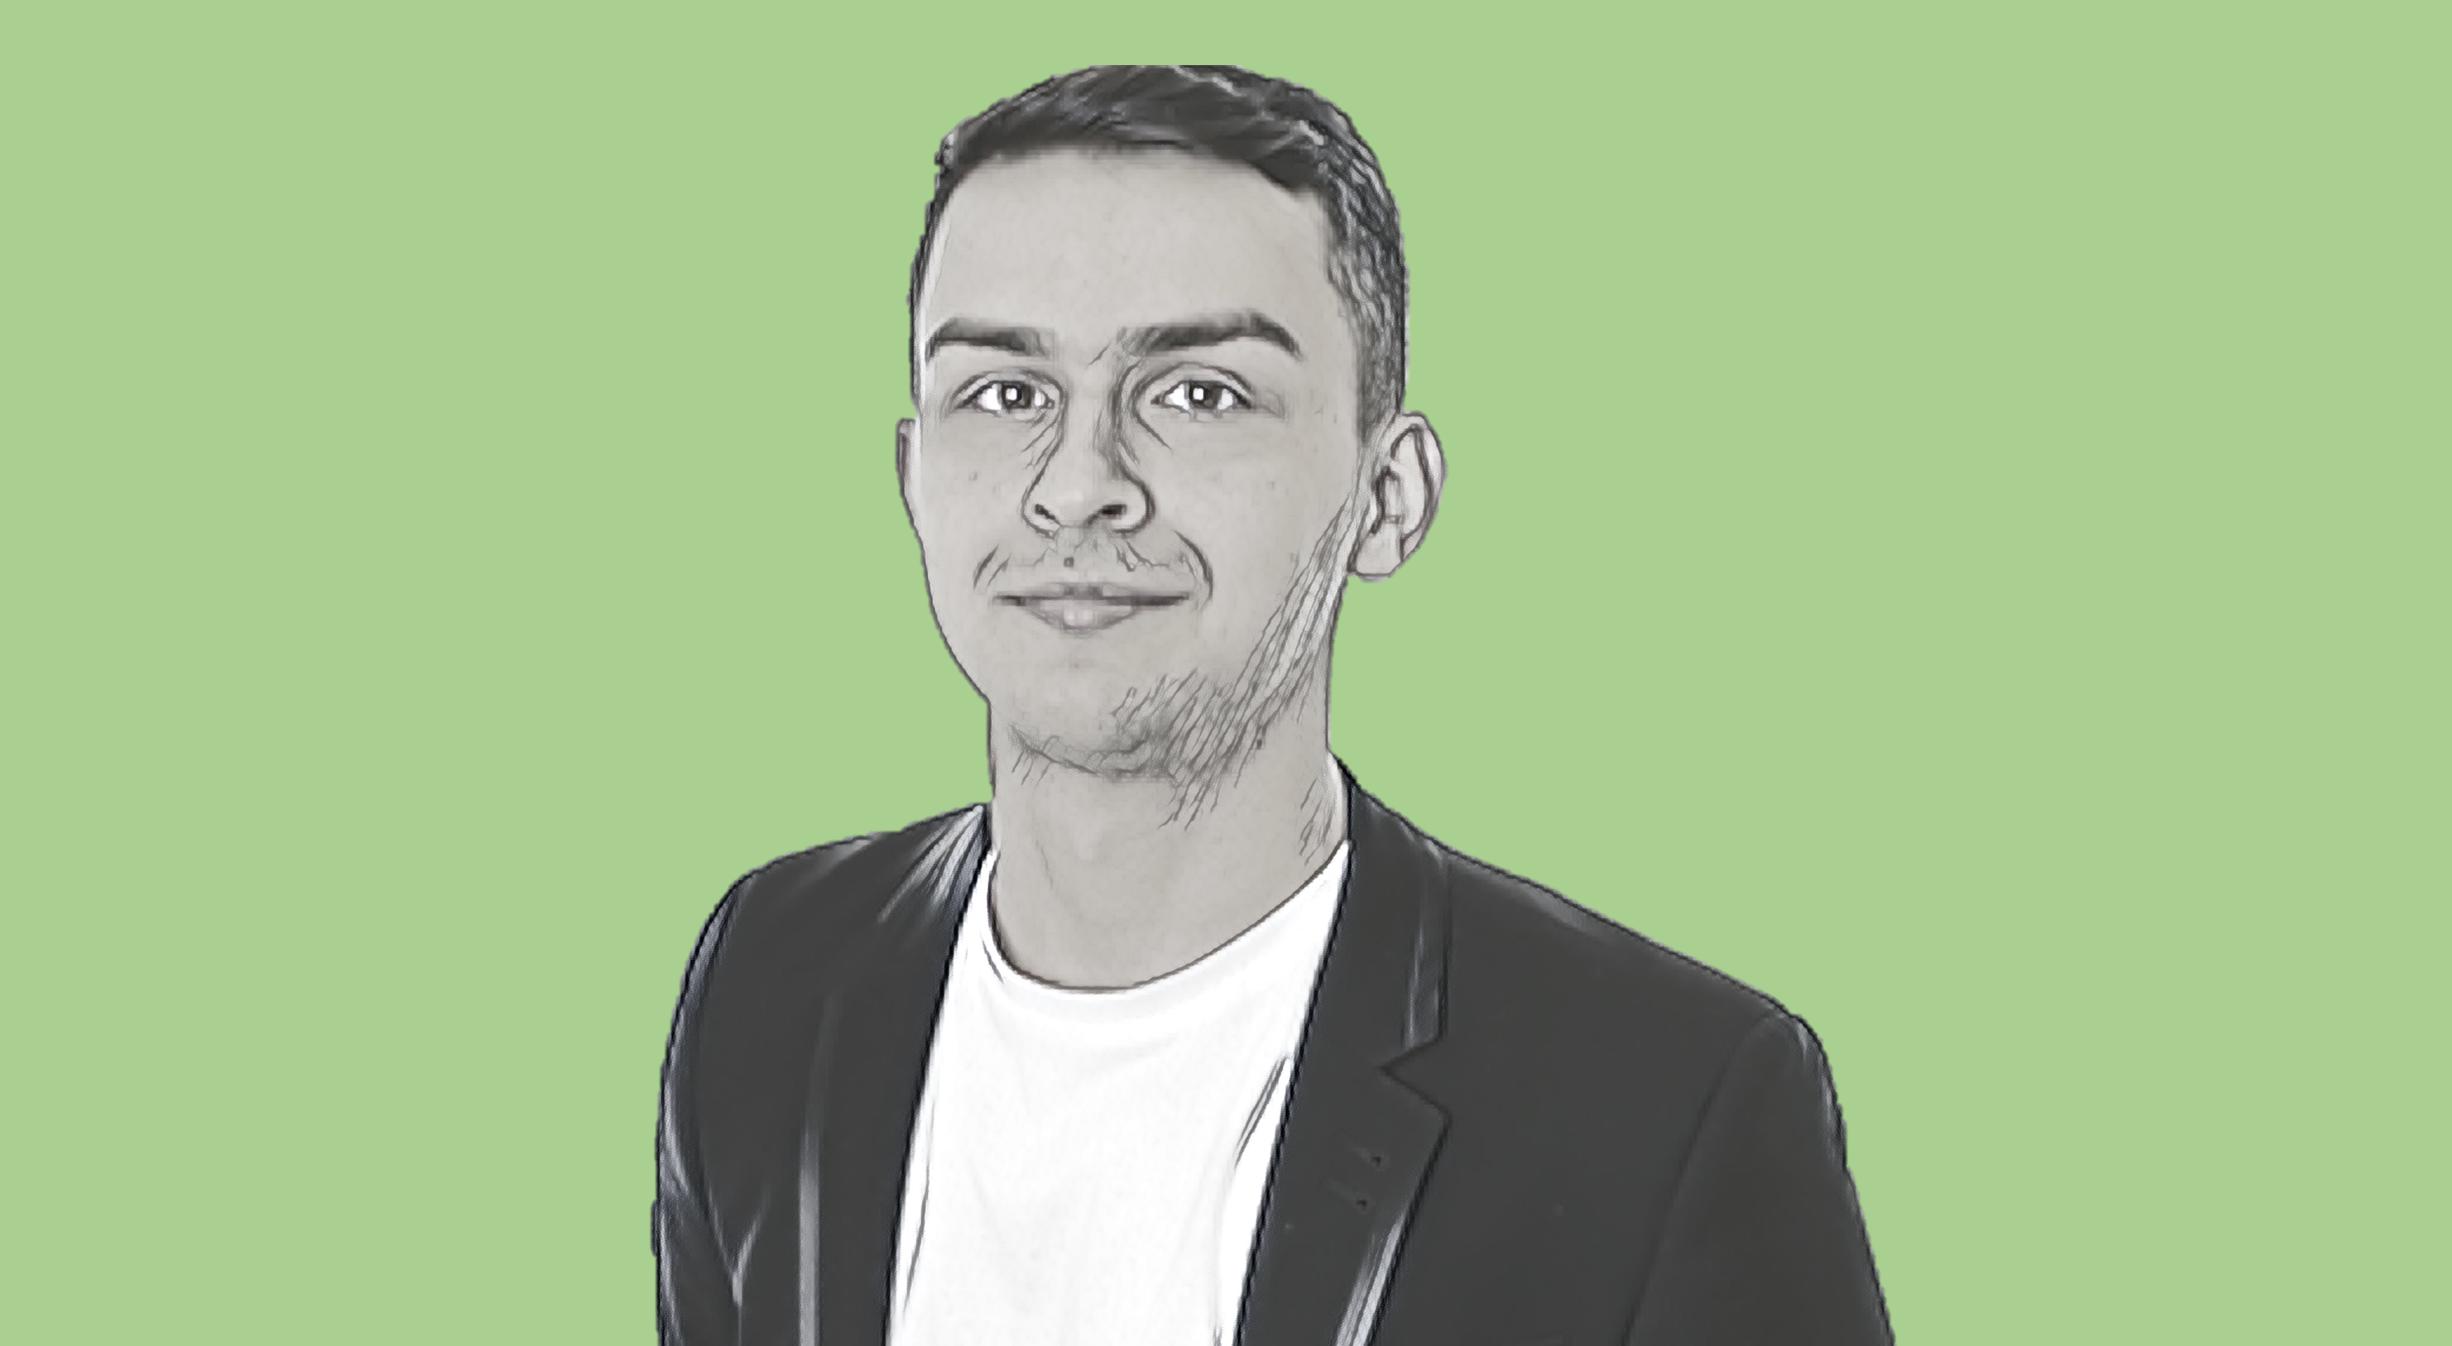 Meet Calin Butnaru - Candidate for Student Media Officer